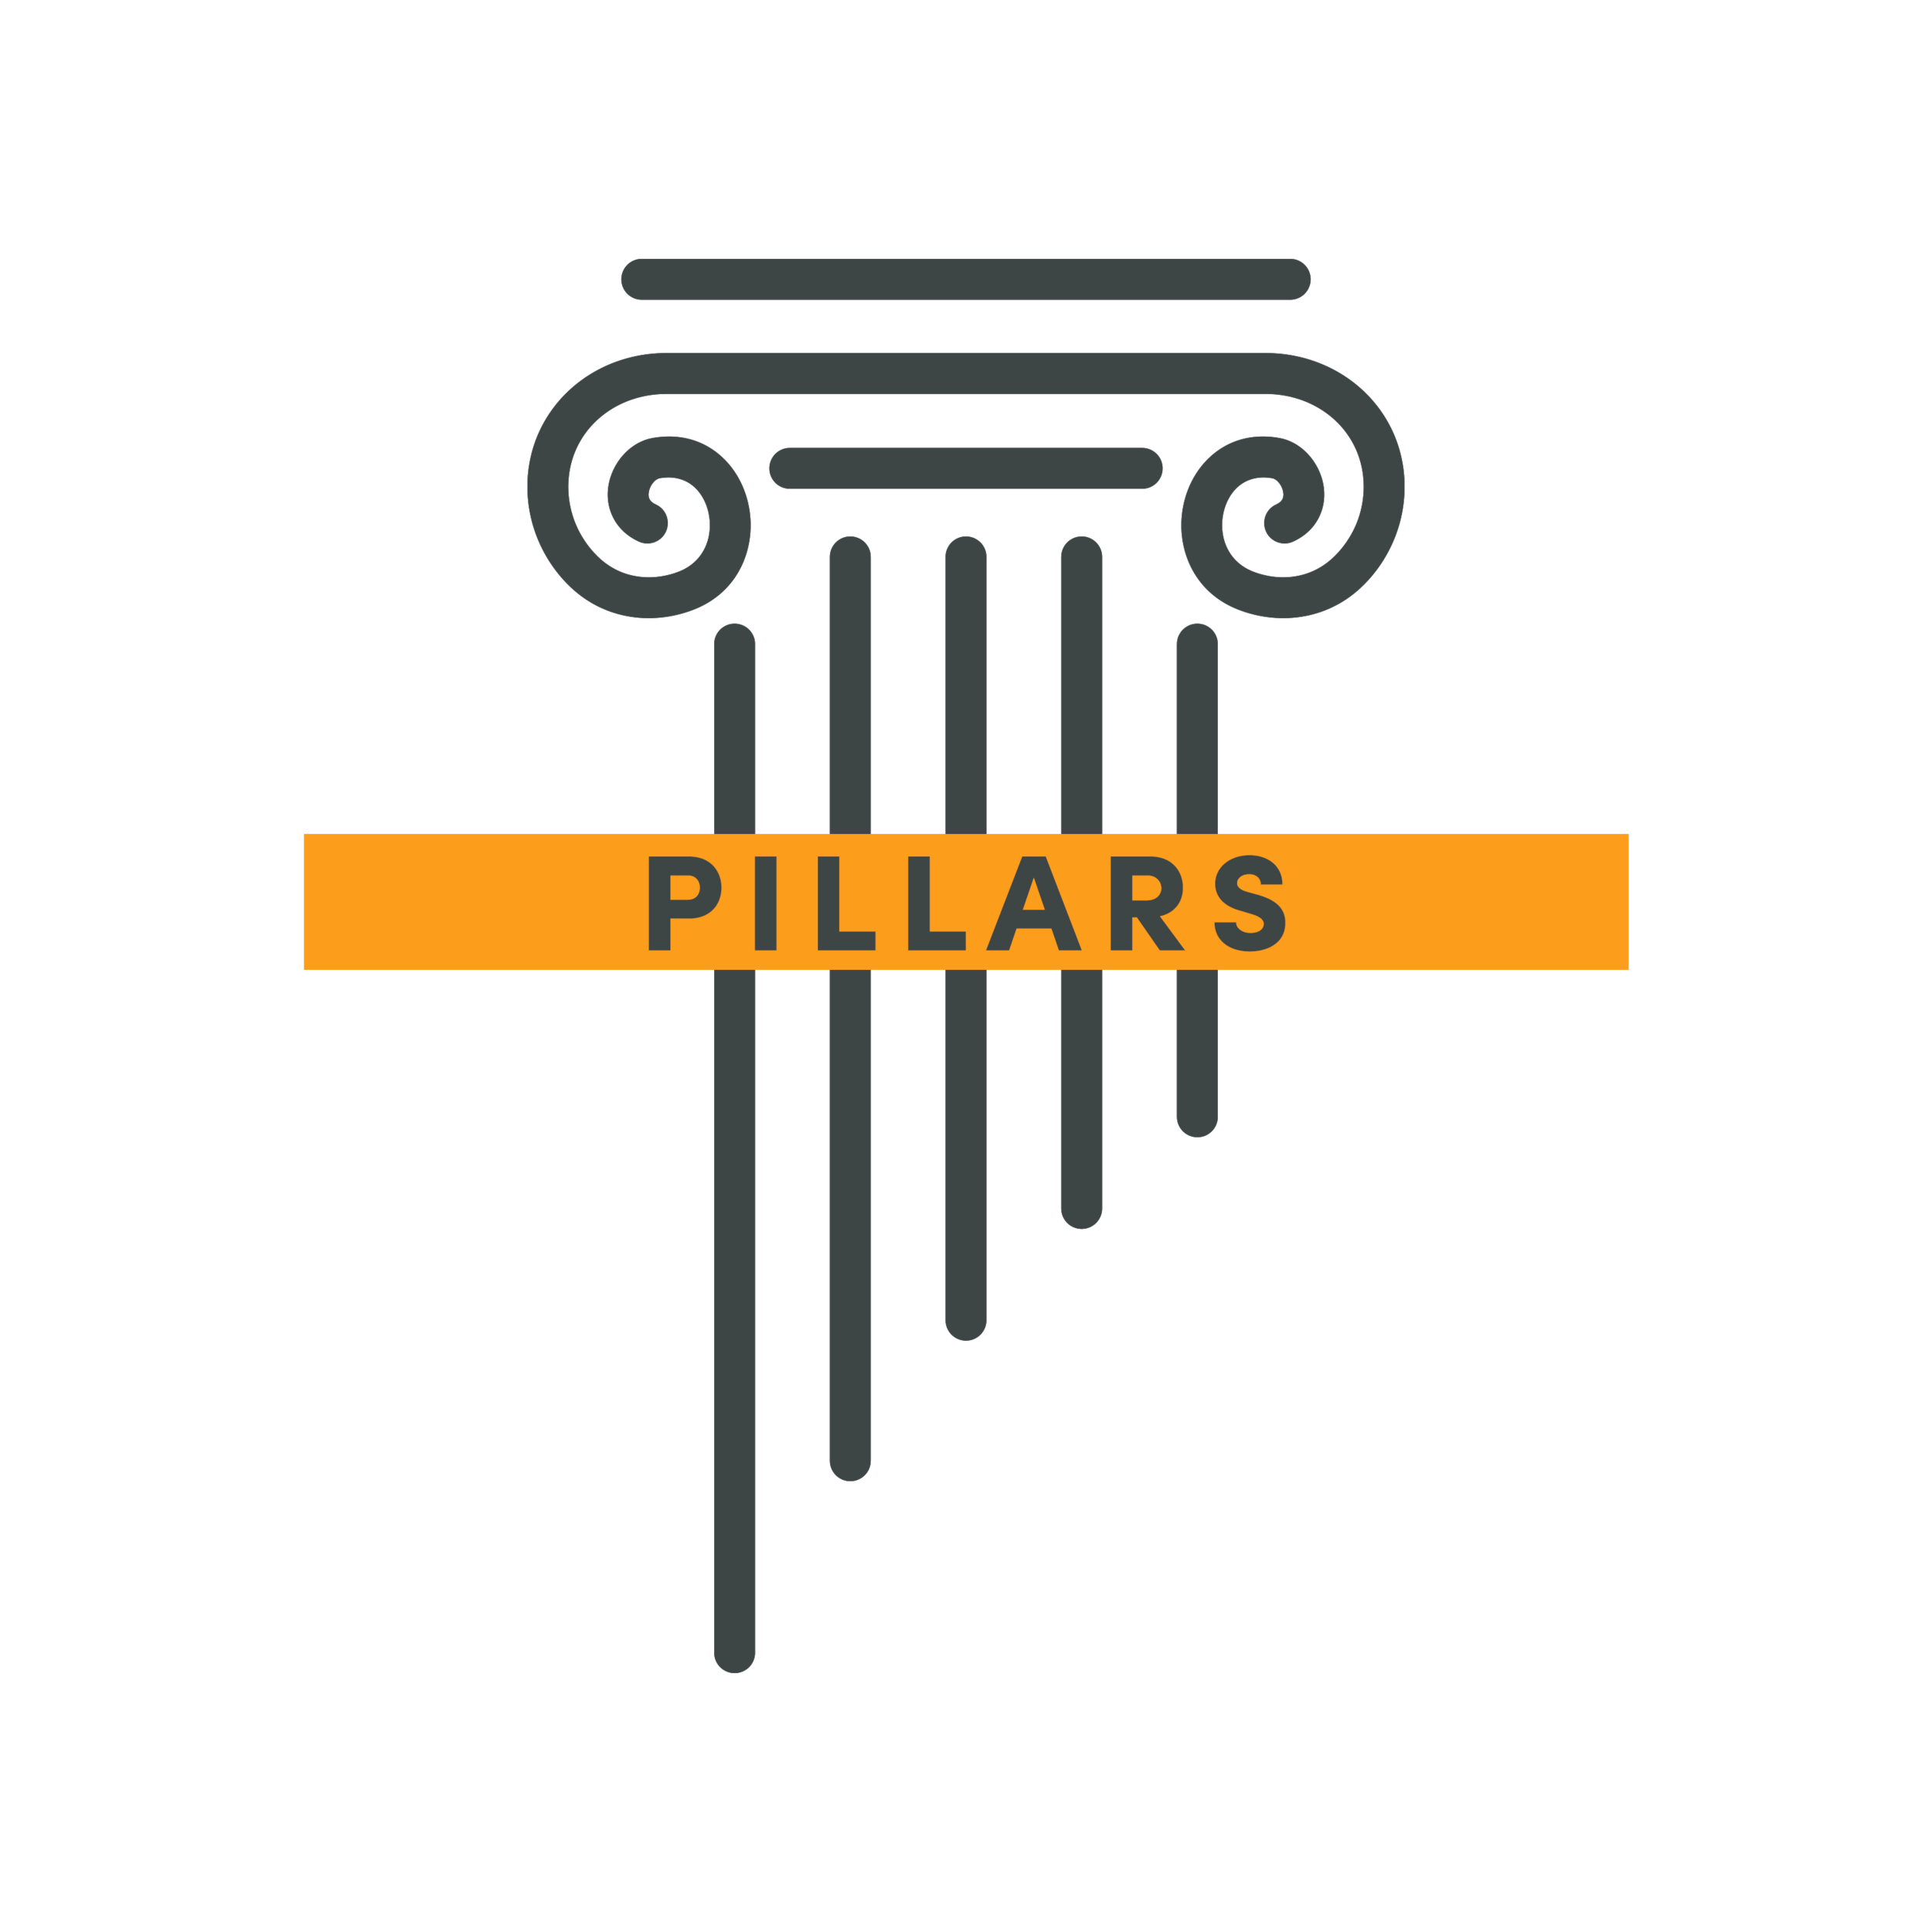 pillars_ministry_logo.png